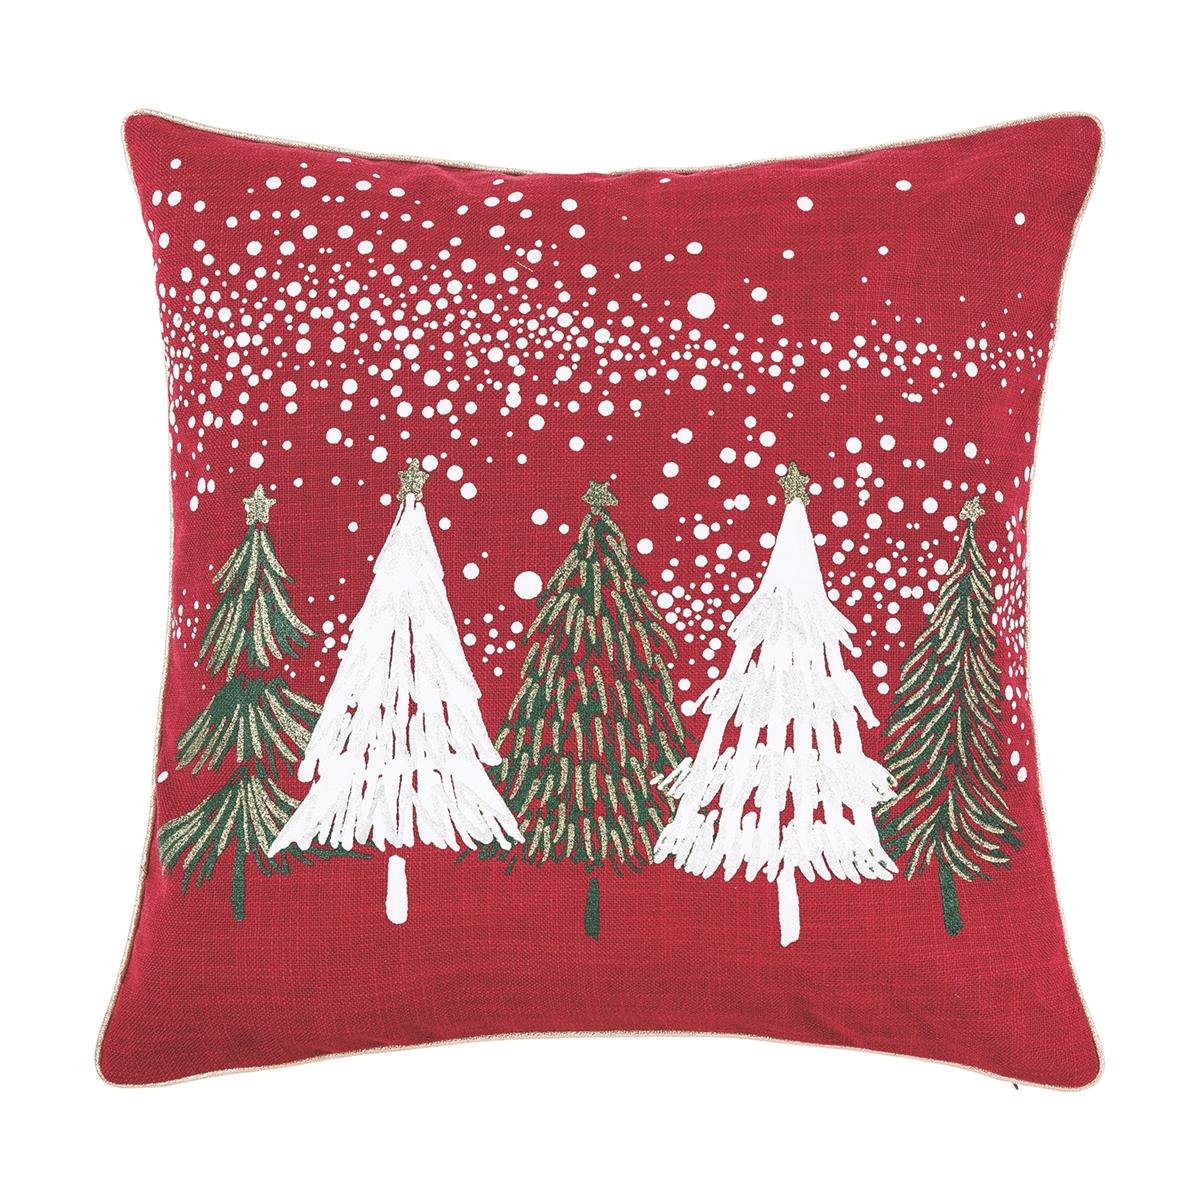 Snowy Trees Pillow